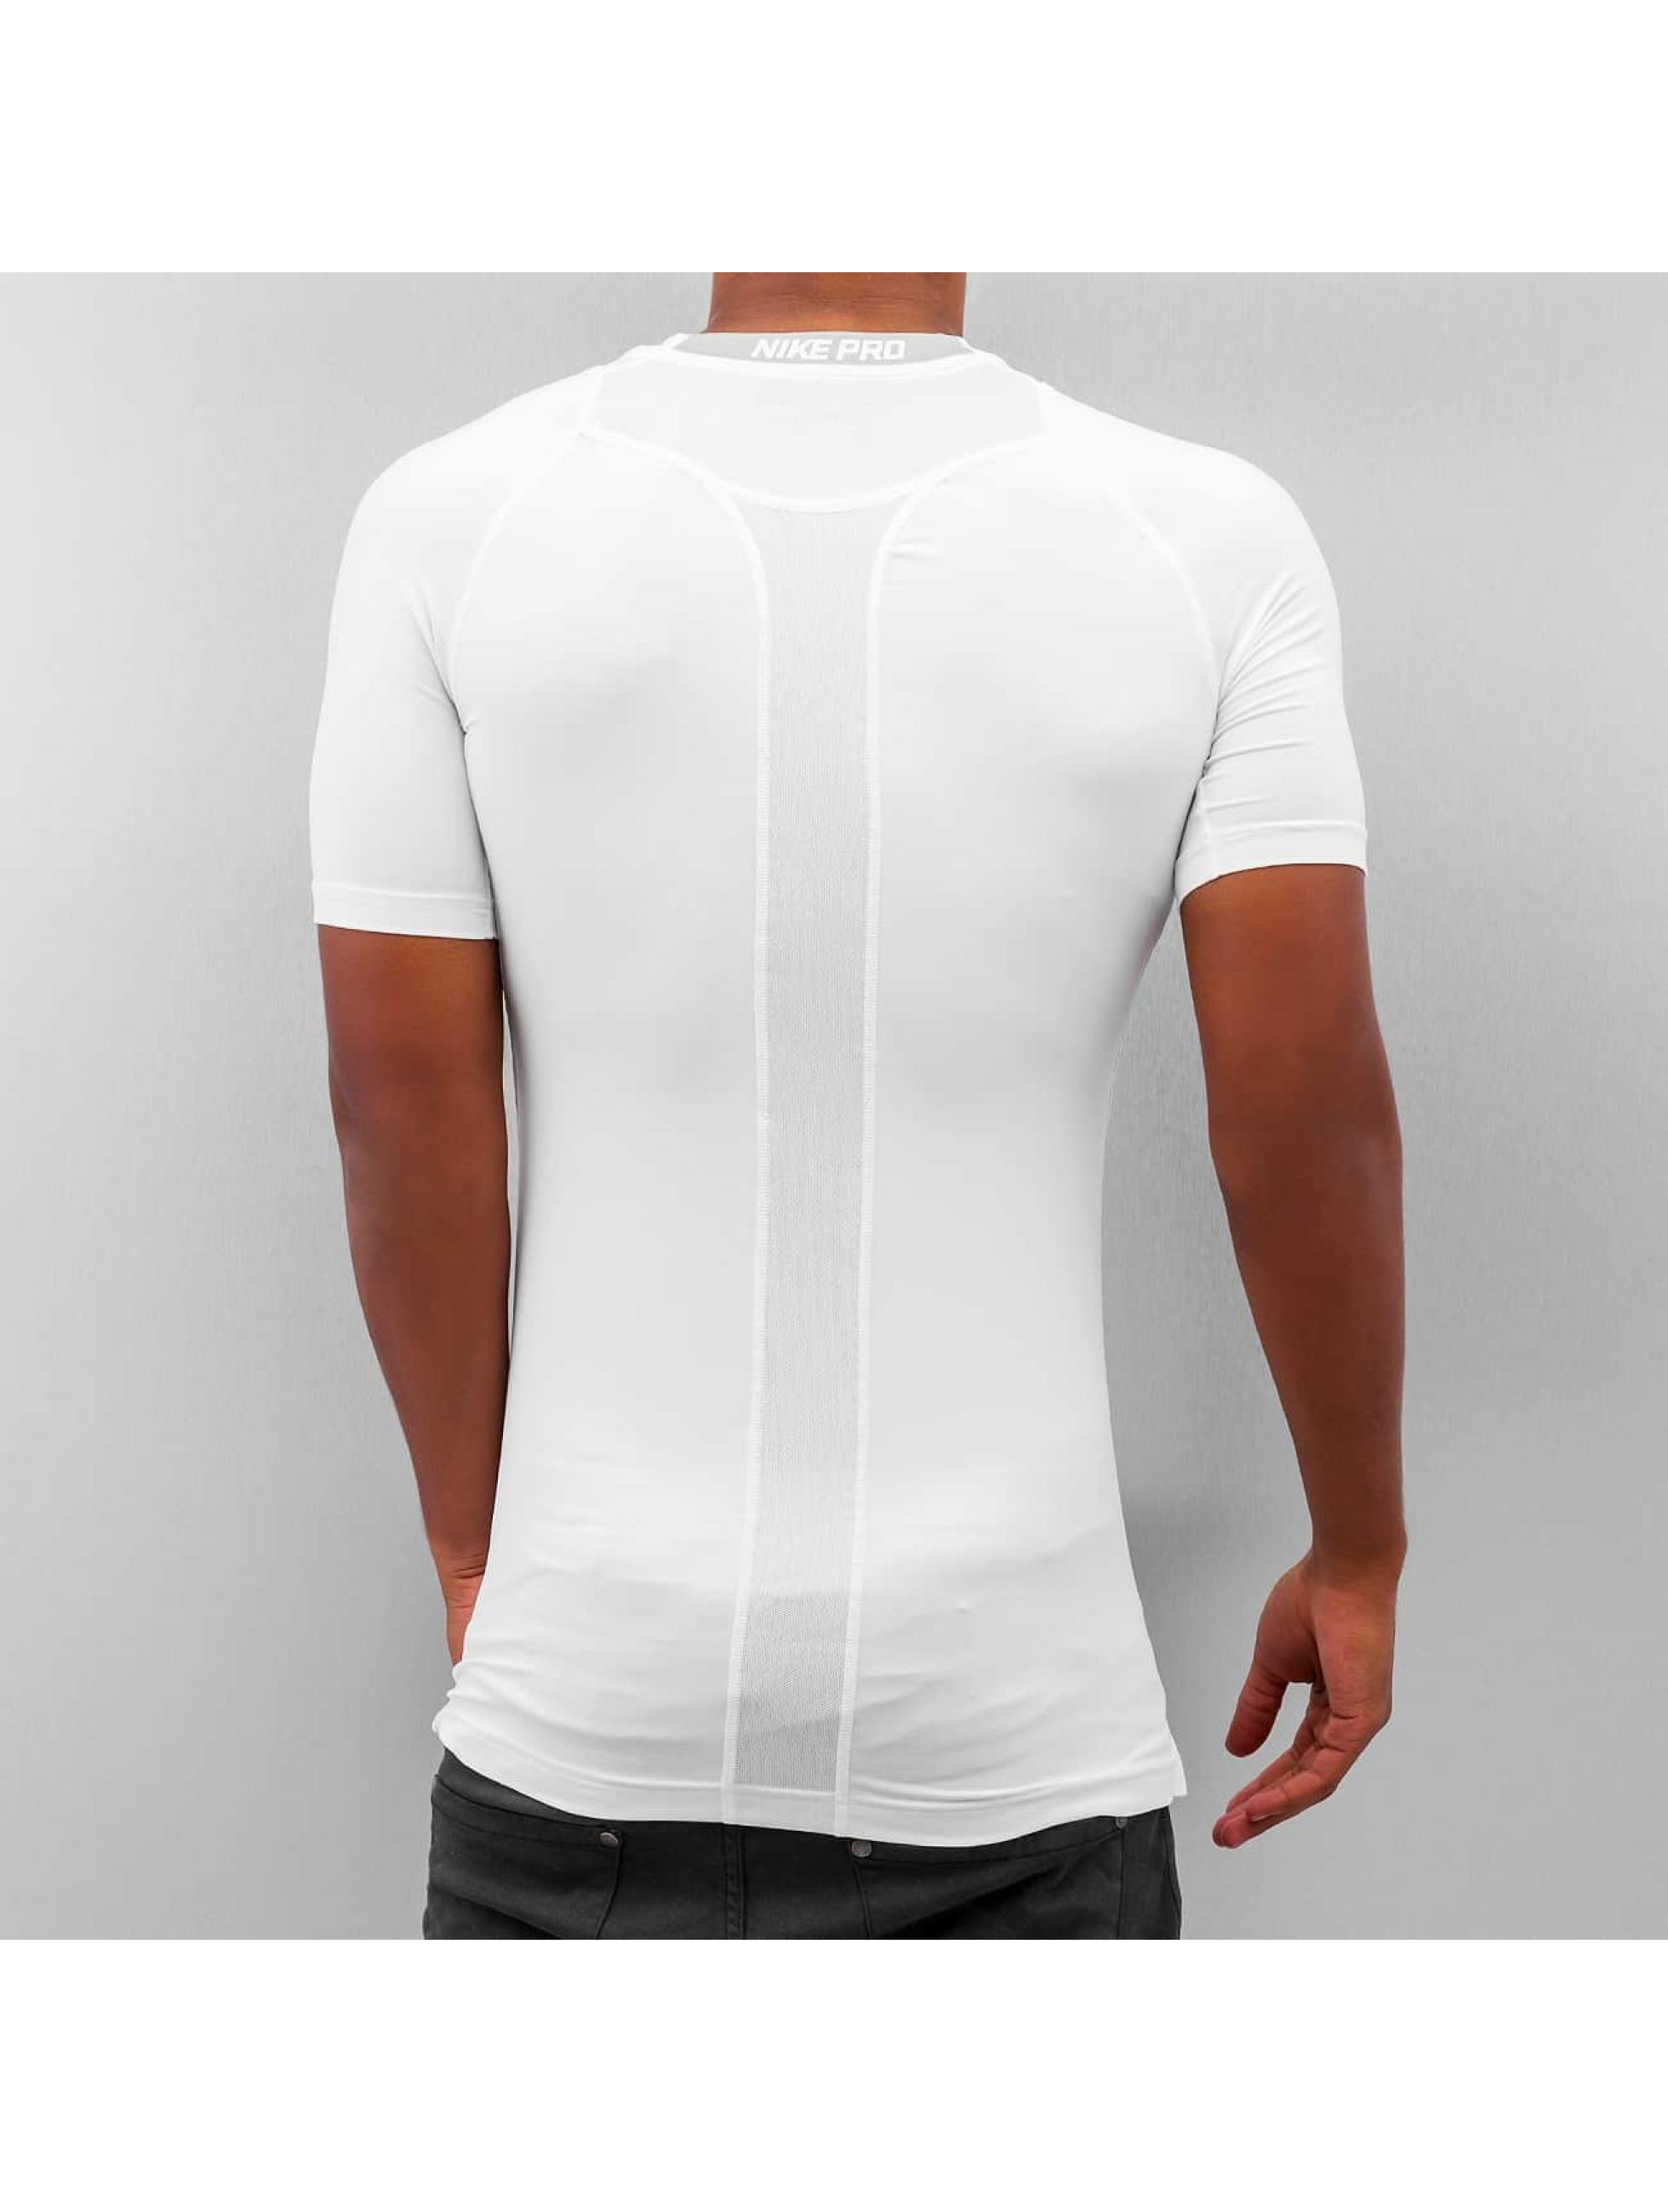 nike performance pro cool compression blanc homme t shirt 218454. Black Bedroom Furniture Sets. Home Design Ideas